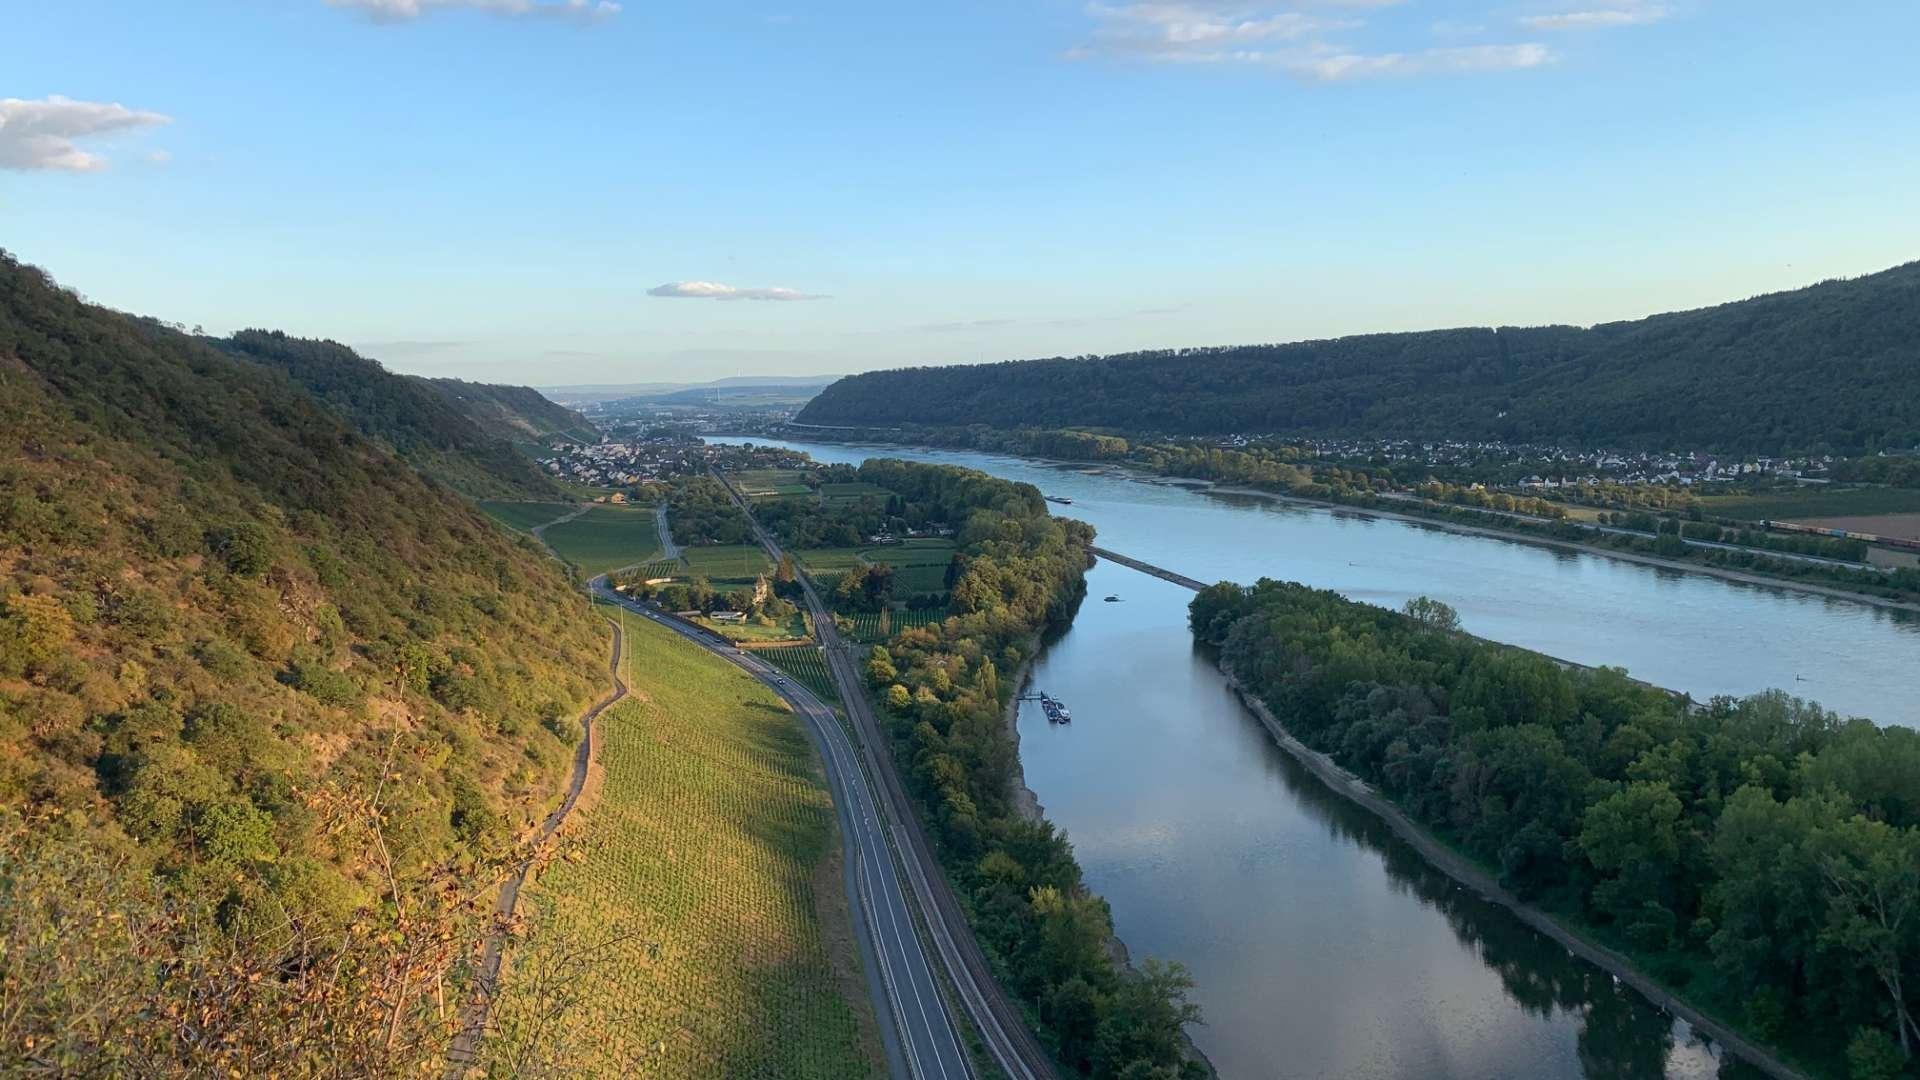 Rheinromantik bei Andernach